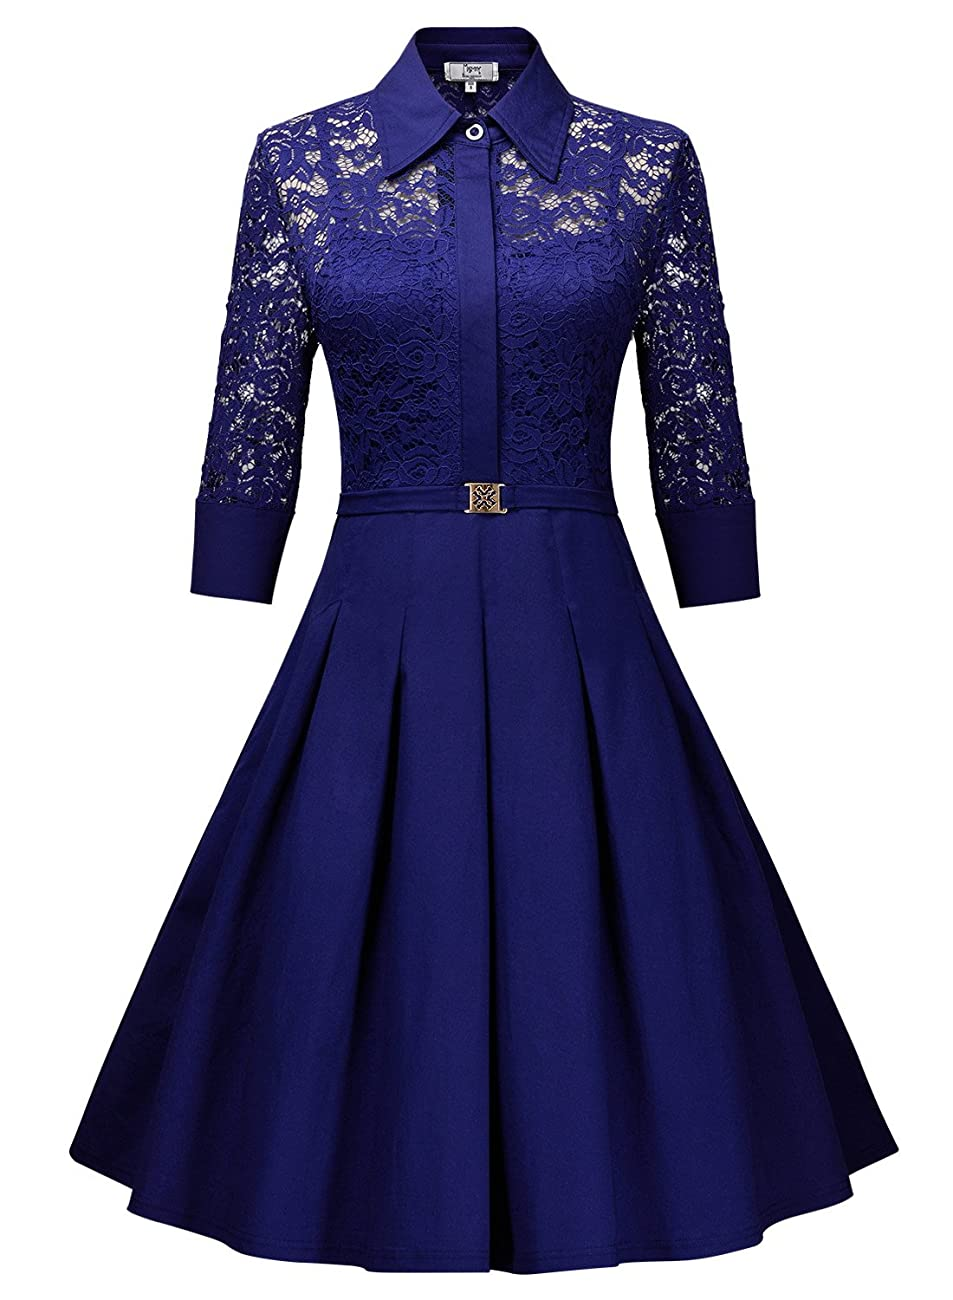 Missmay Women's Vintage 1950s Style 3/4 Sleeve Black Lace Flare A-line Dress 2